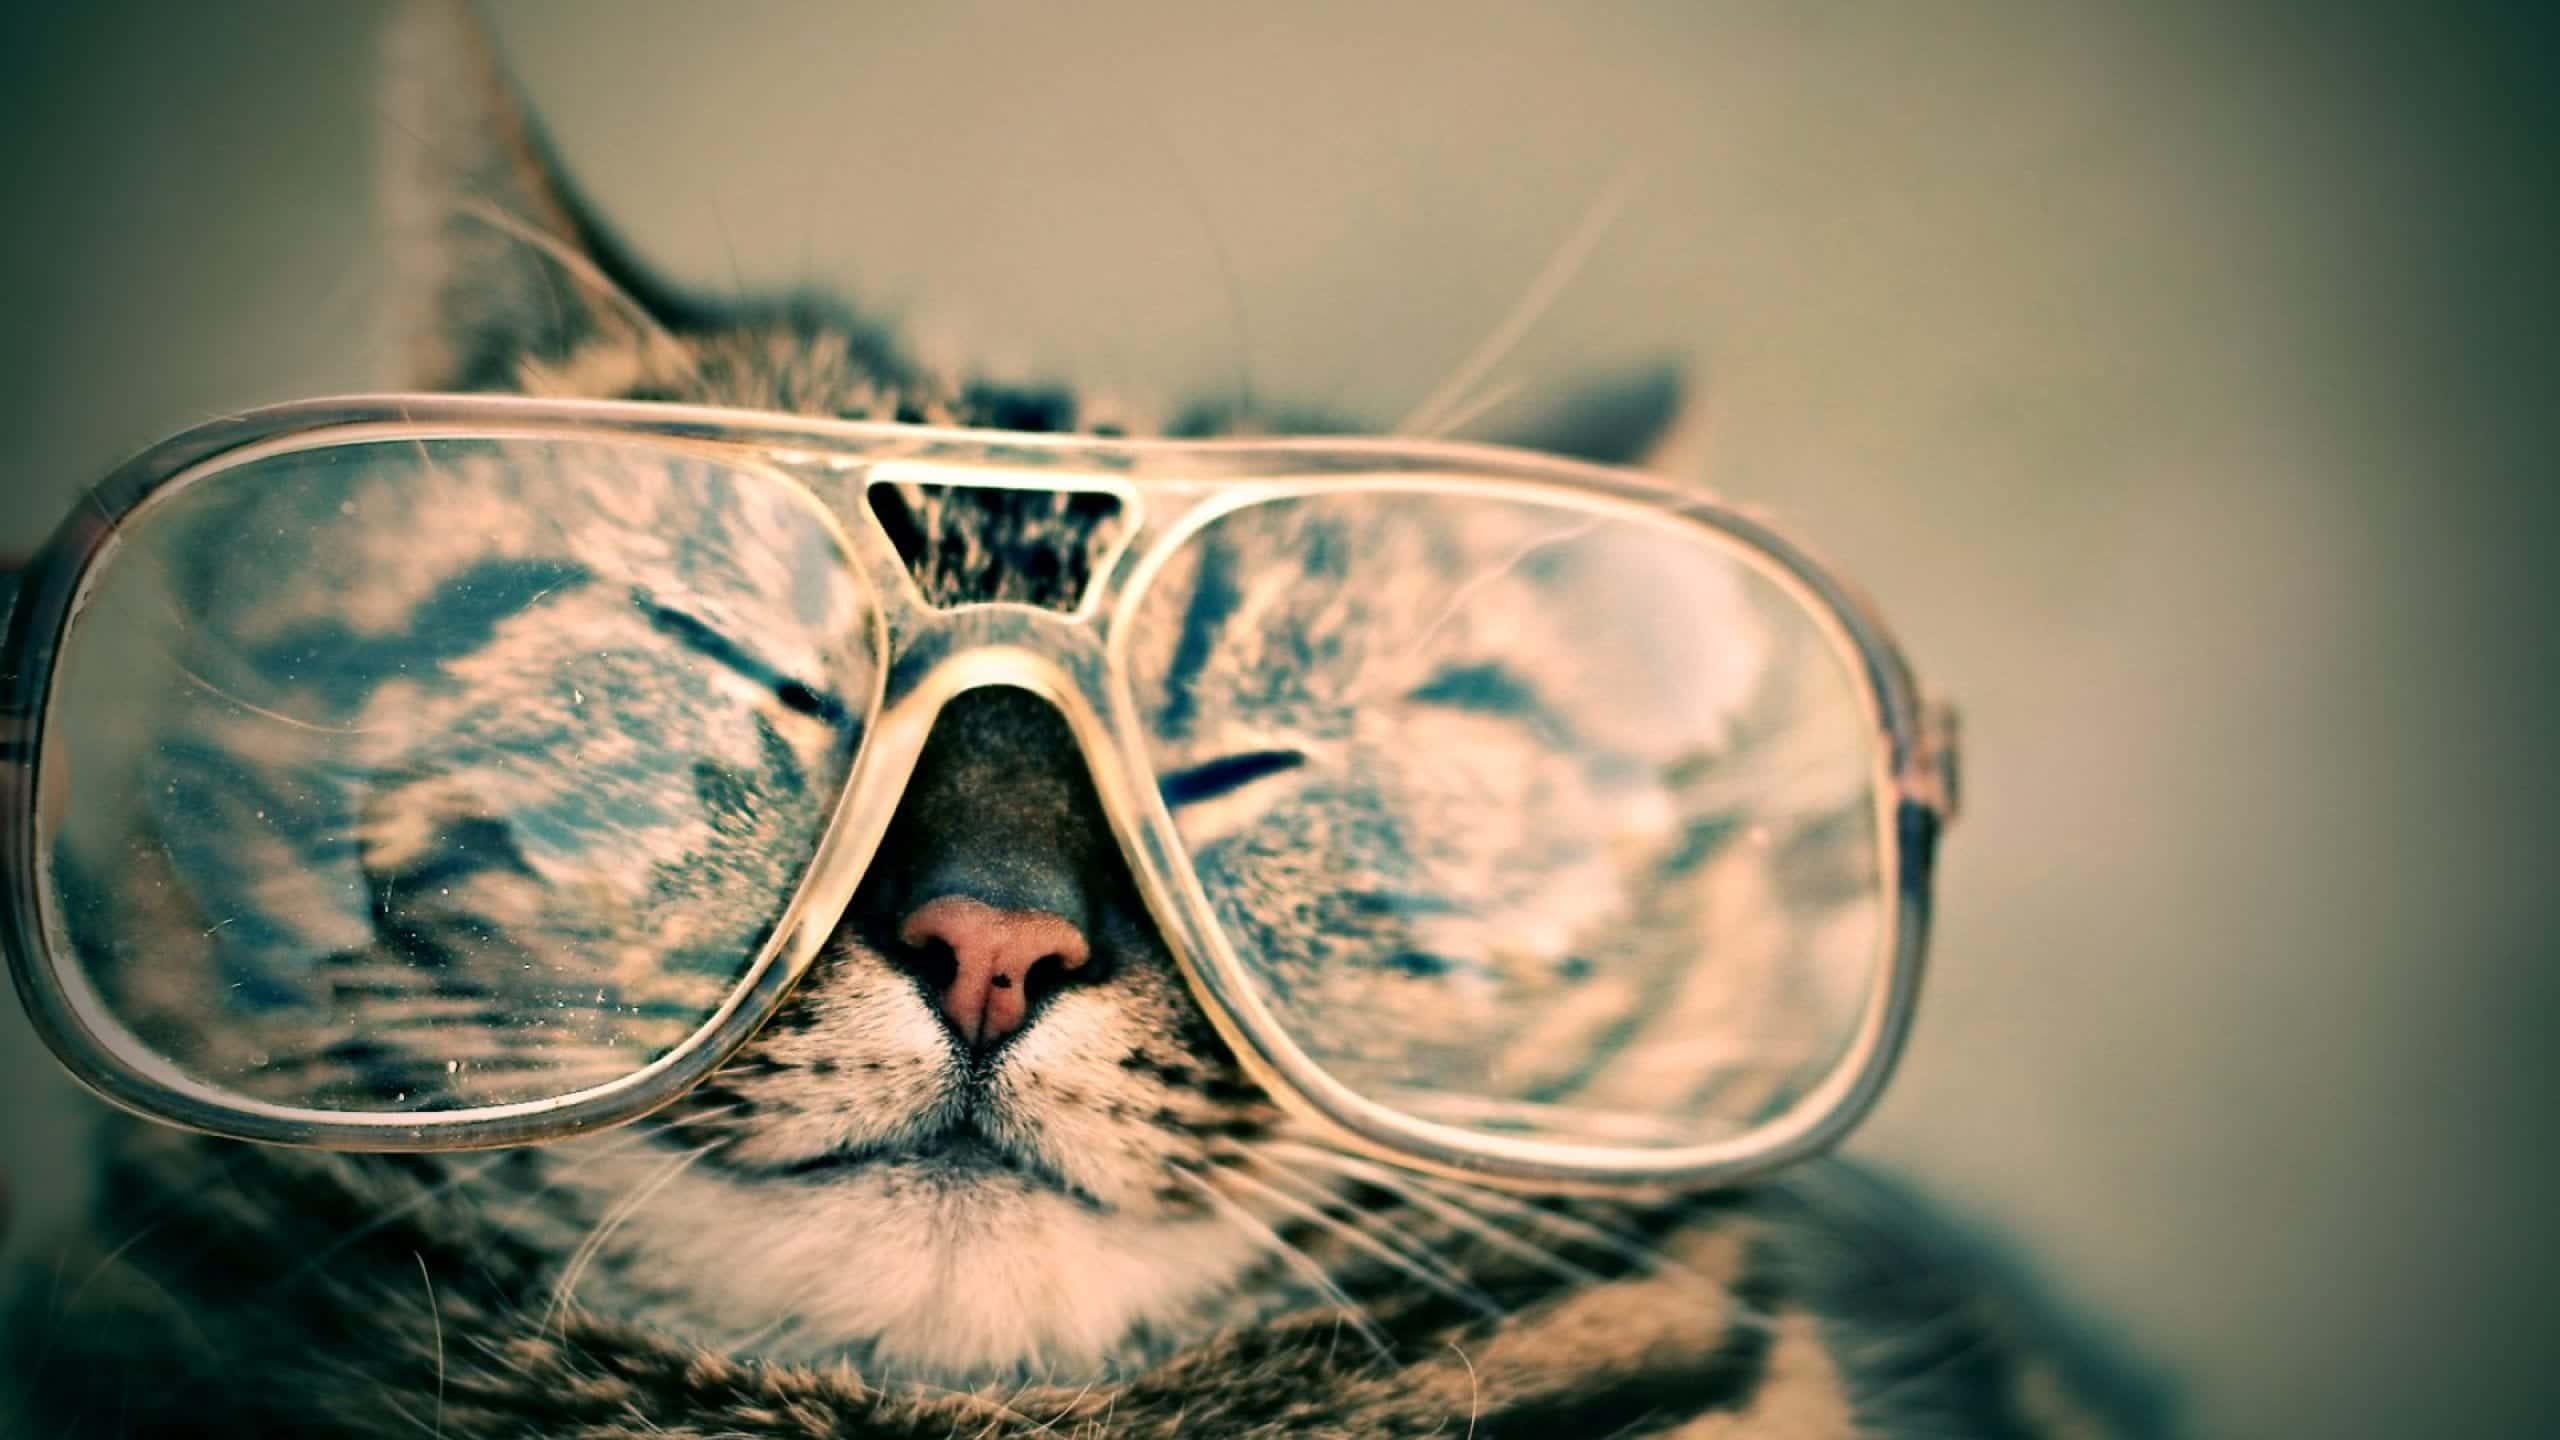 Gato con gafas durmiendo